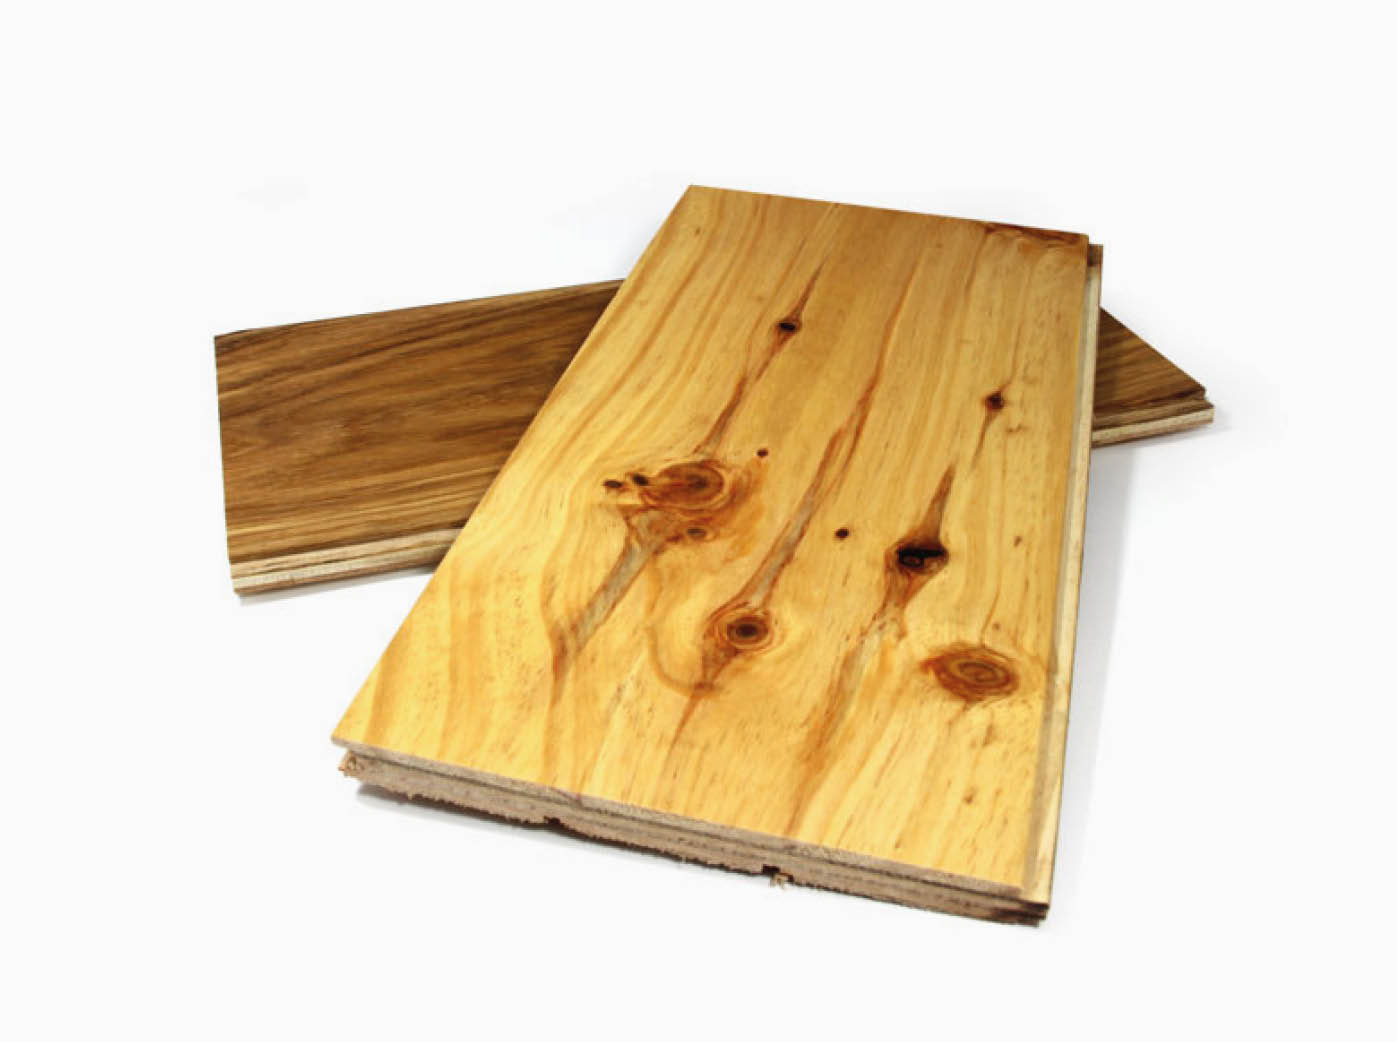 naturtec light floorboard soalho madeira